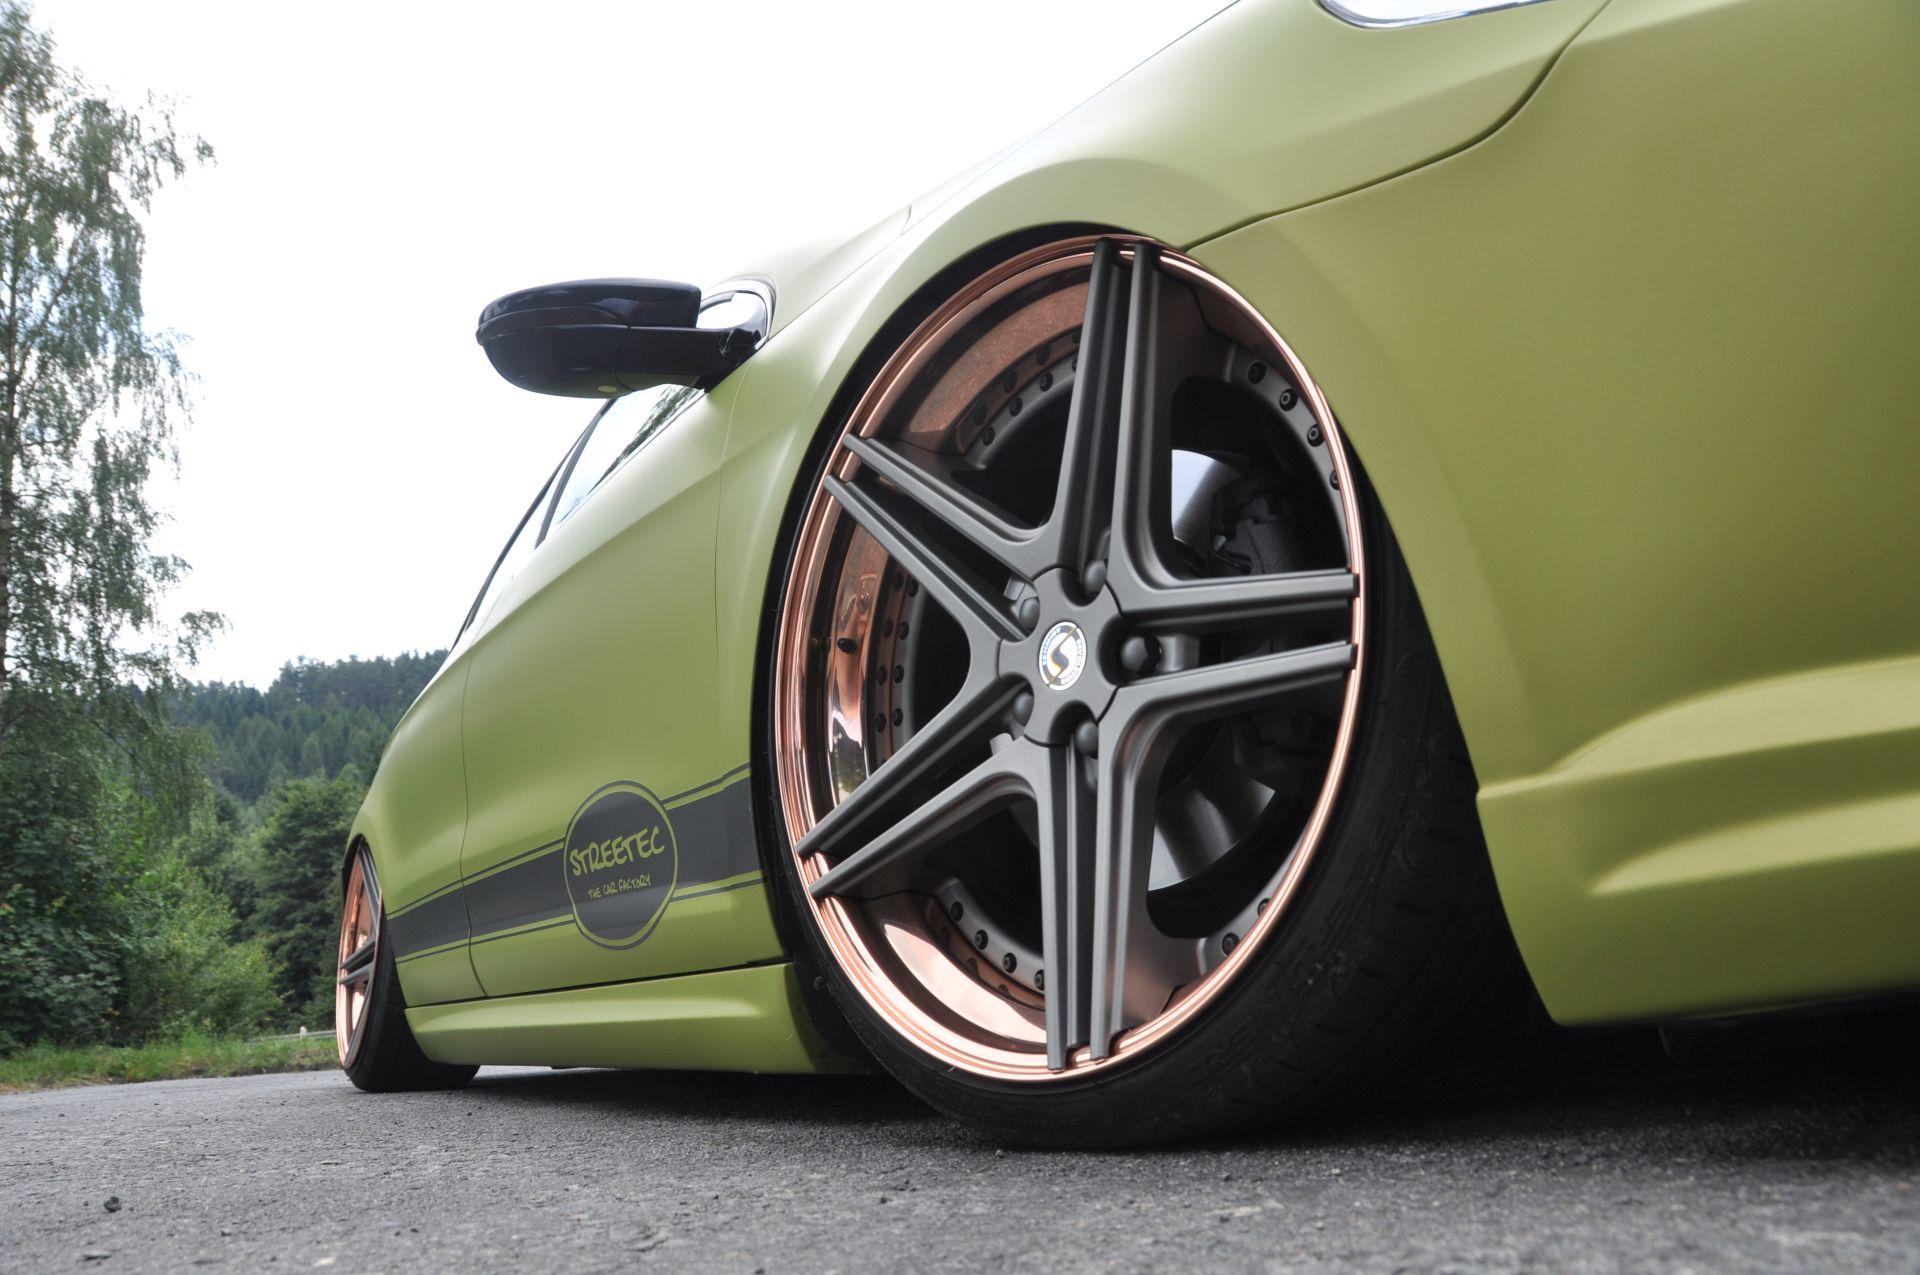 Schmidt_Passat-CC_FS-Line_wheels_002